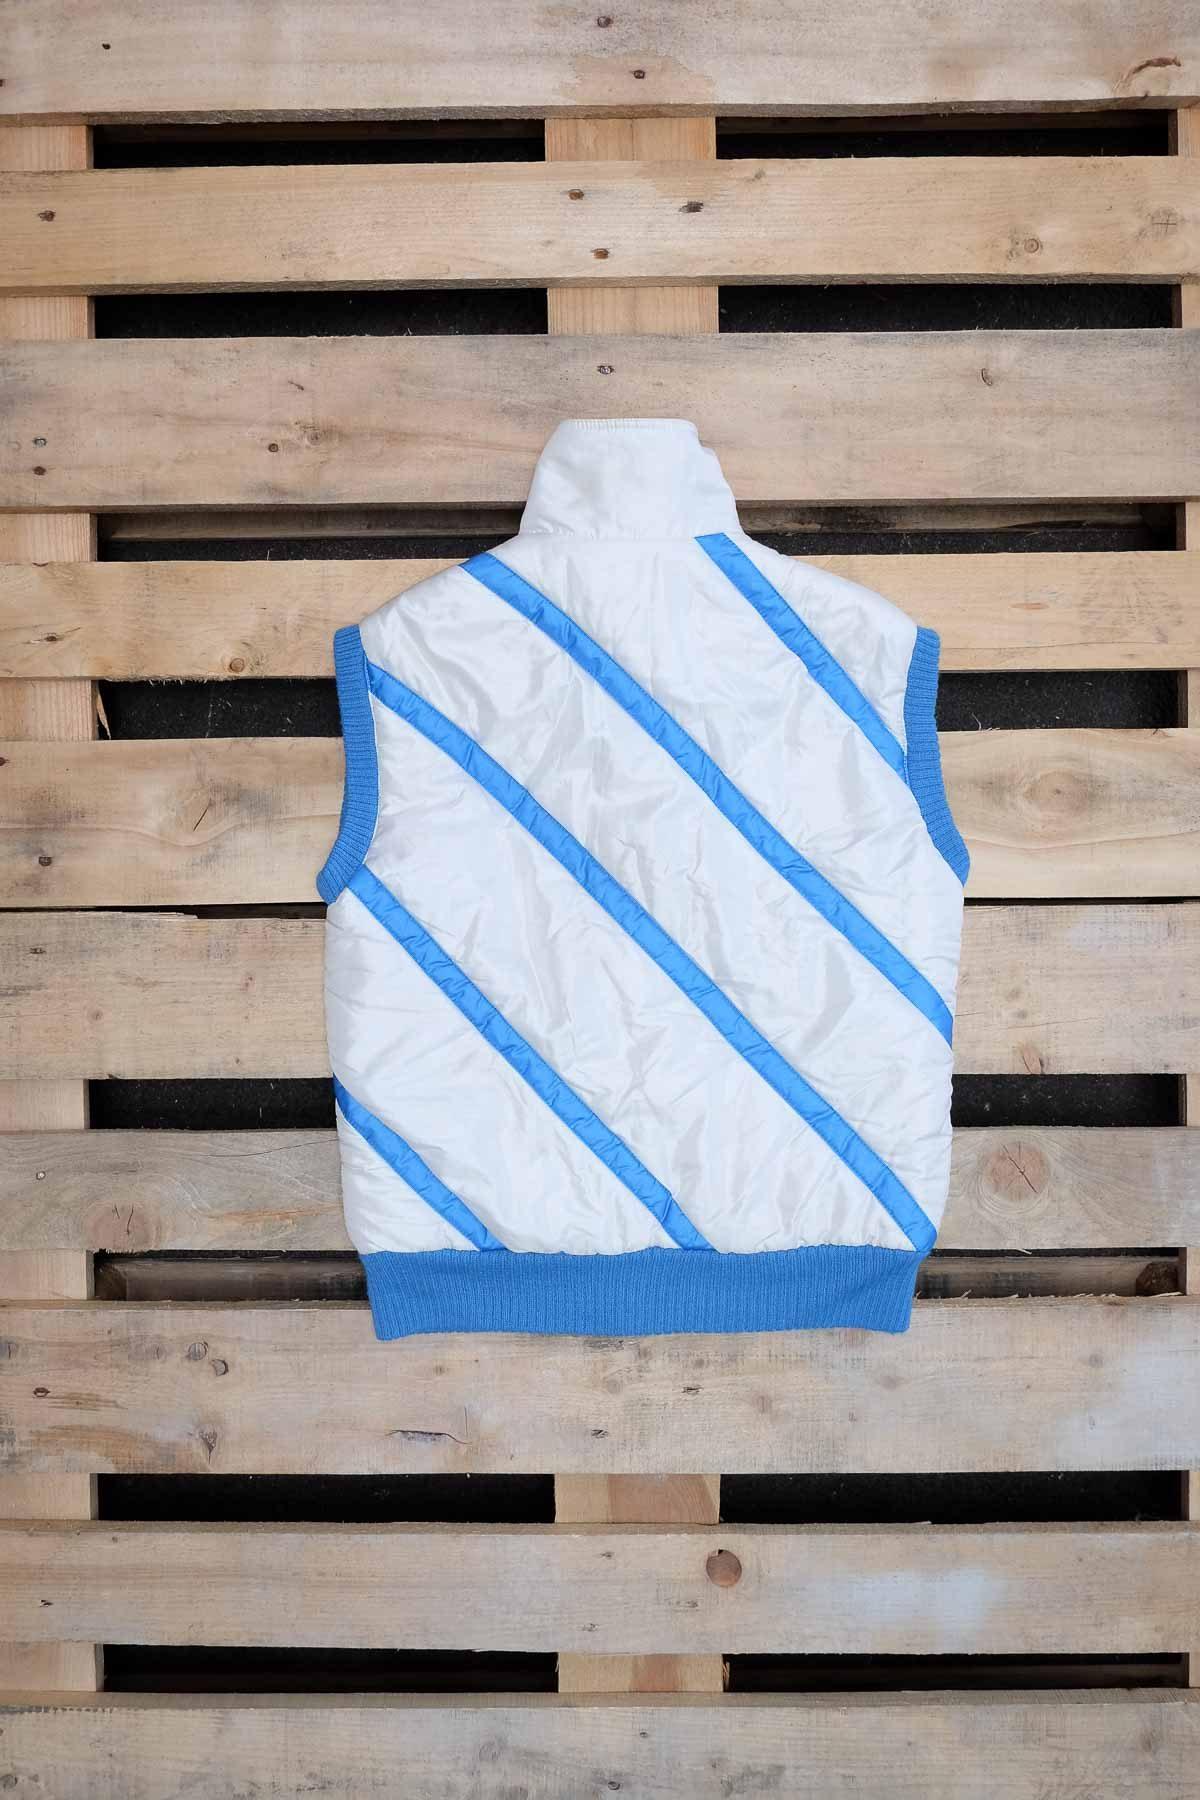 Ellesse SMANICATO VINTAGE Bianco-Azzurro M